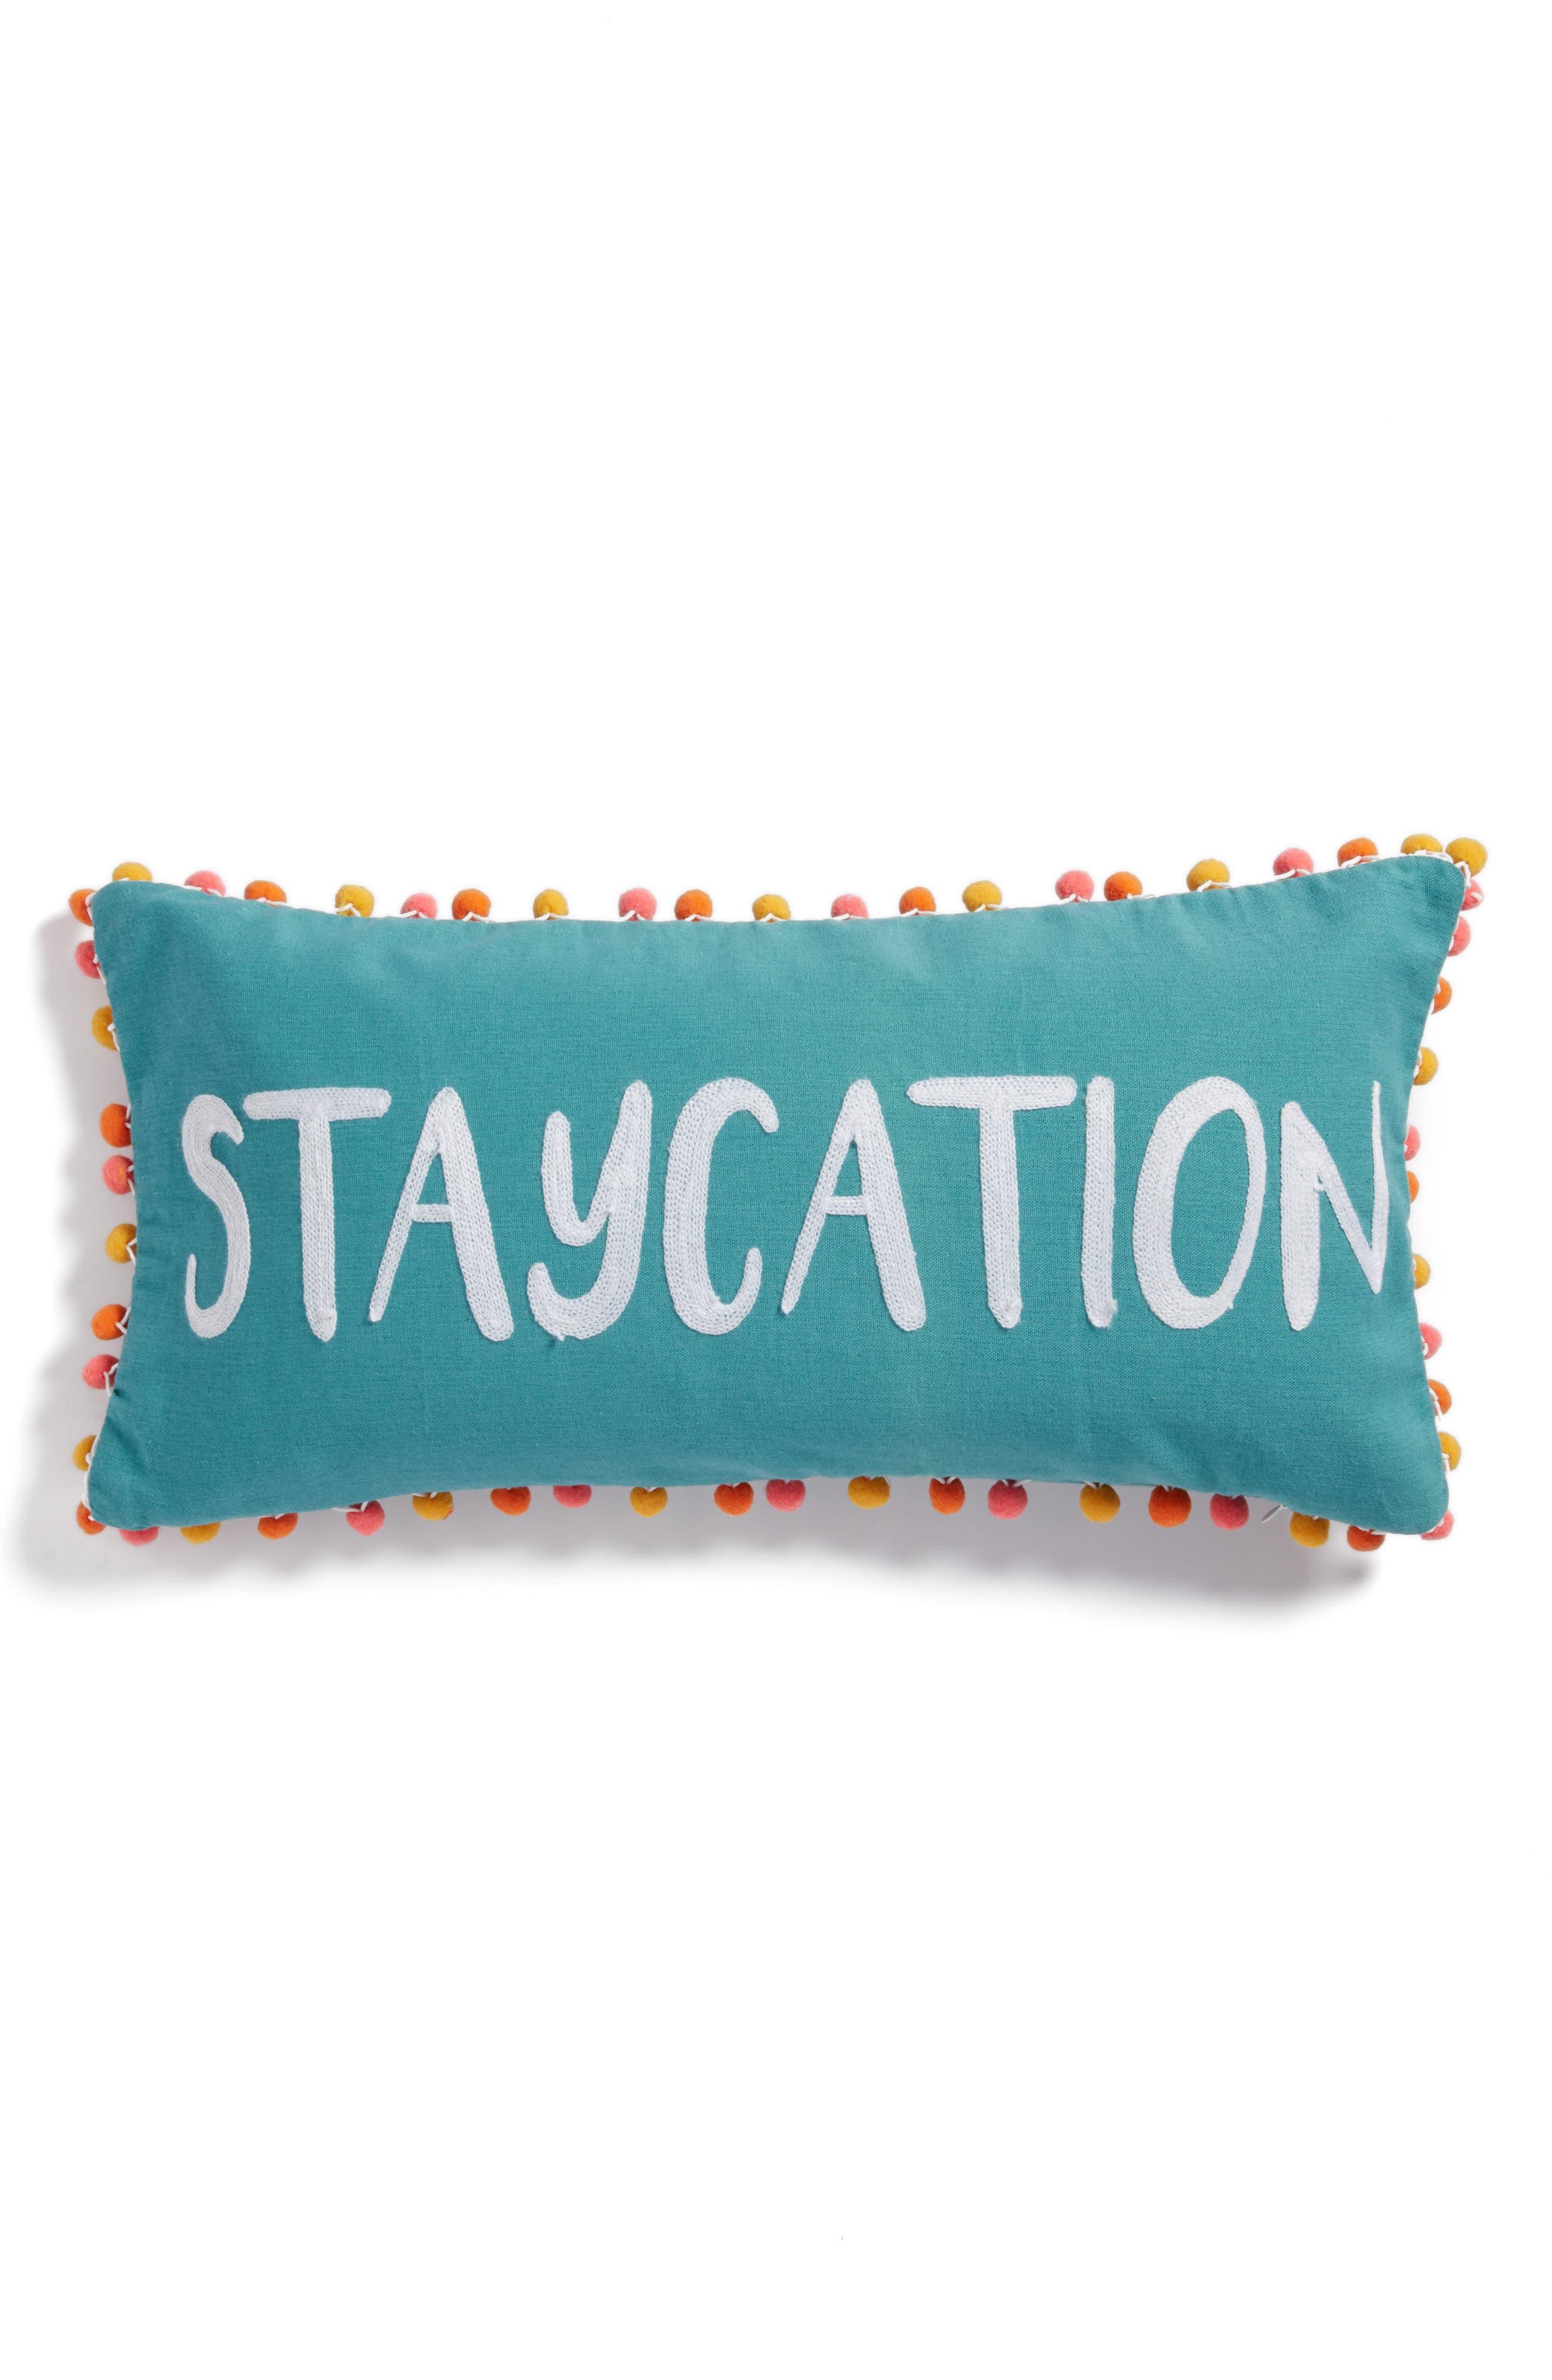 Carmen Staycation Accent Pillow,                         Main,                         color, Blue